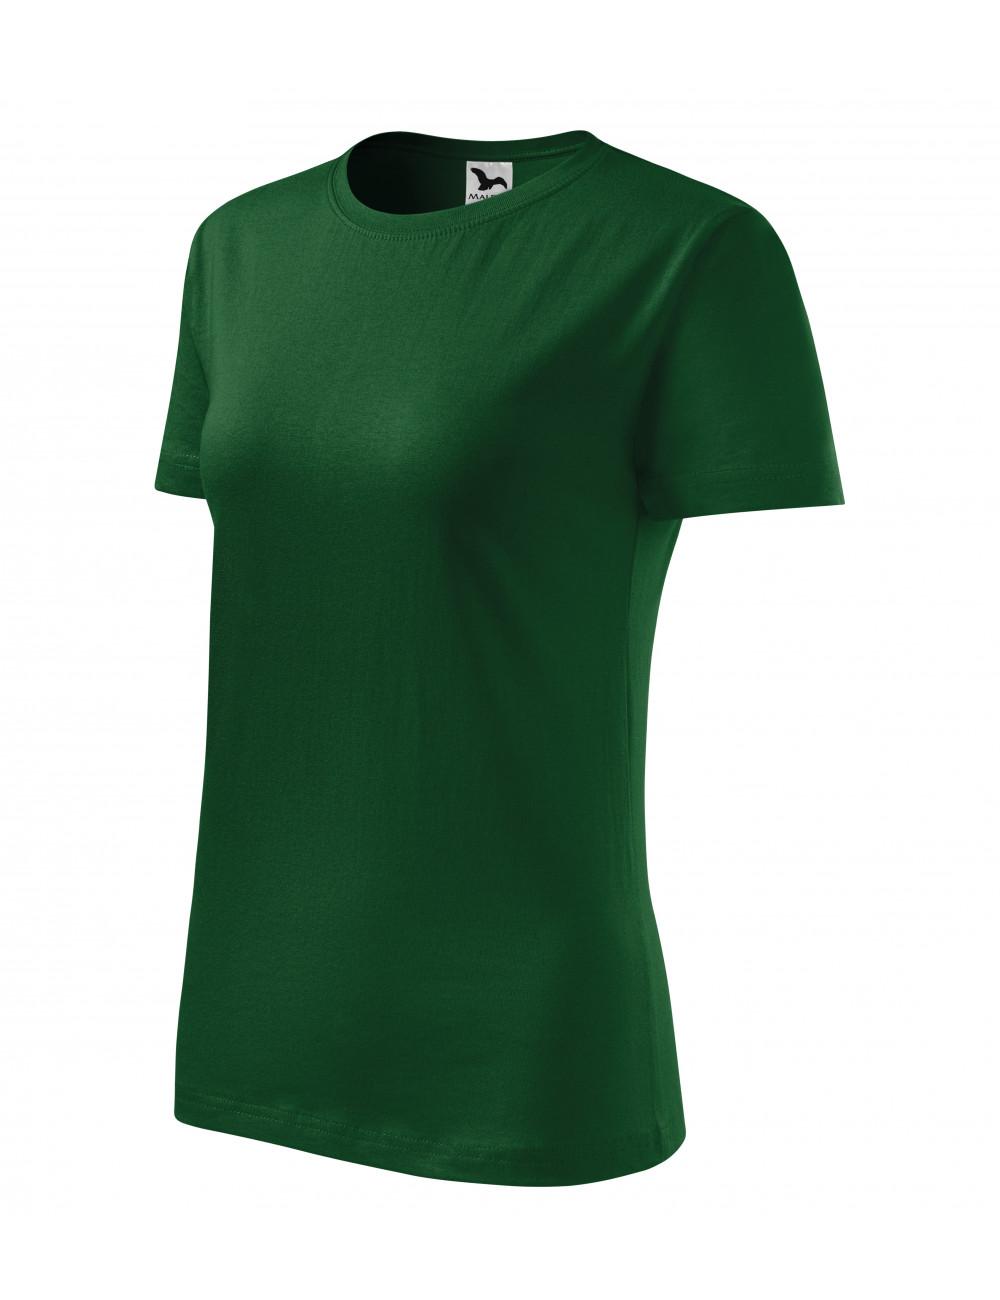 Adler MALFINI Koszulka damska Classic New 133 zieleń butelkowa